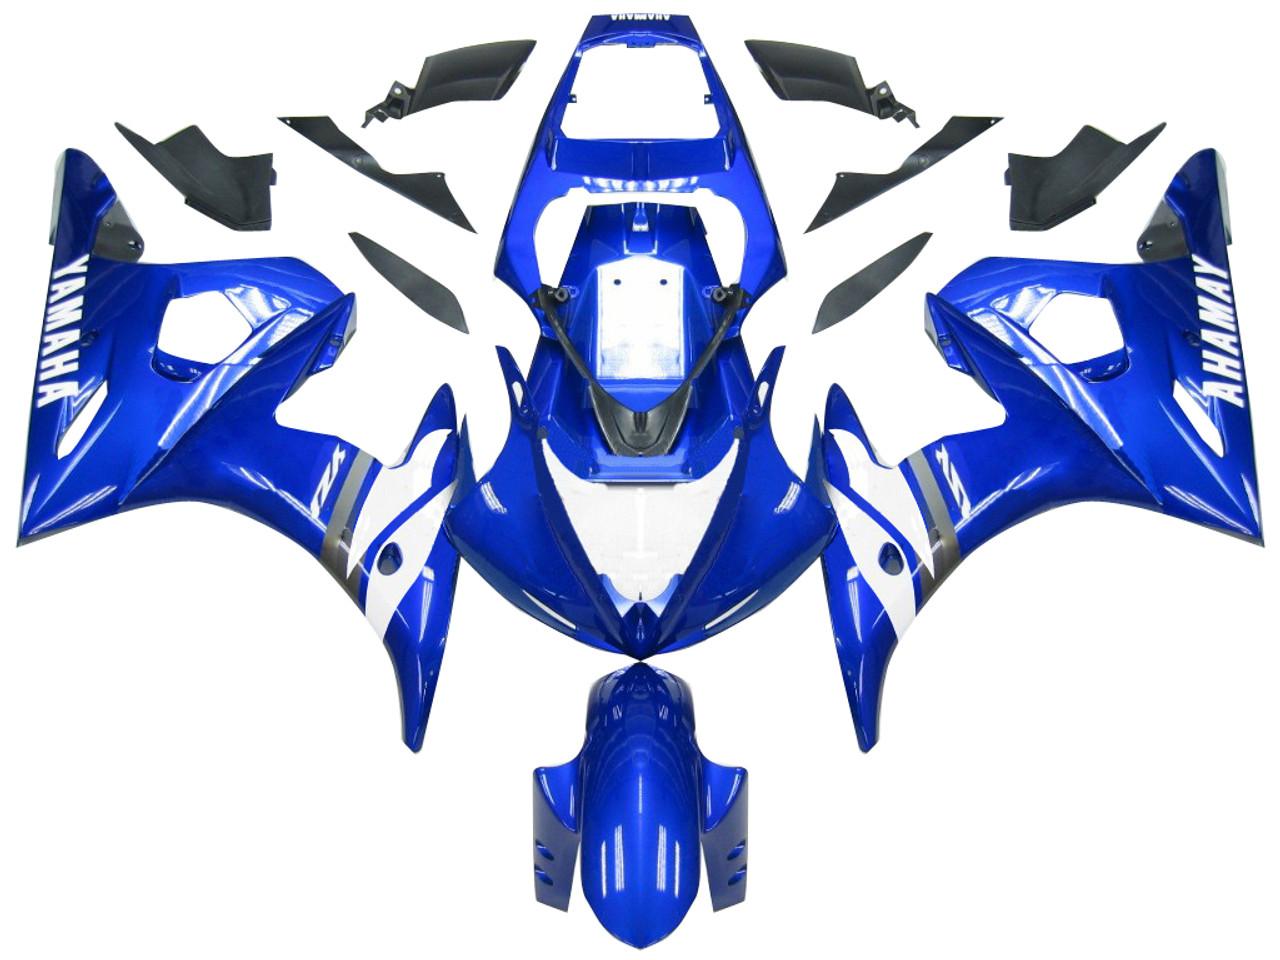 Fairings Yamaha YZF-R6 Blue White R6 Racing (2003-2005)